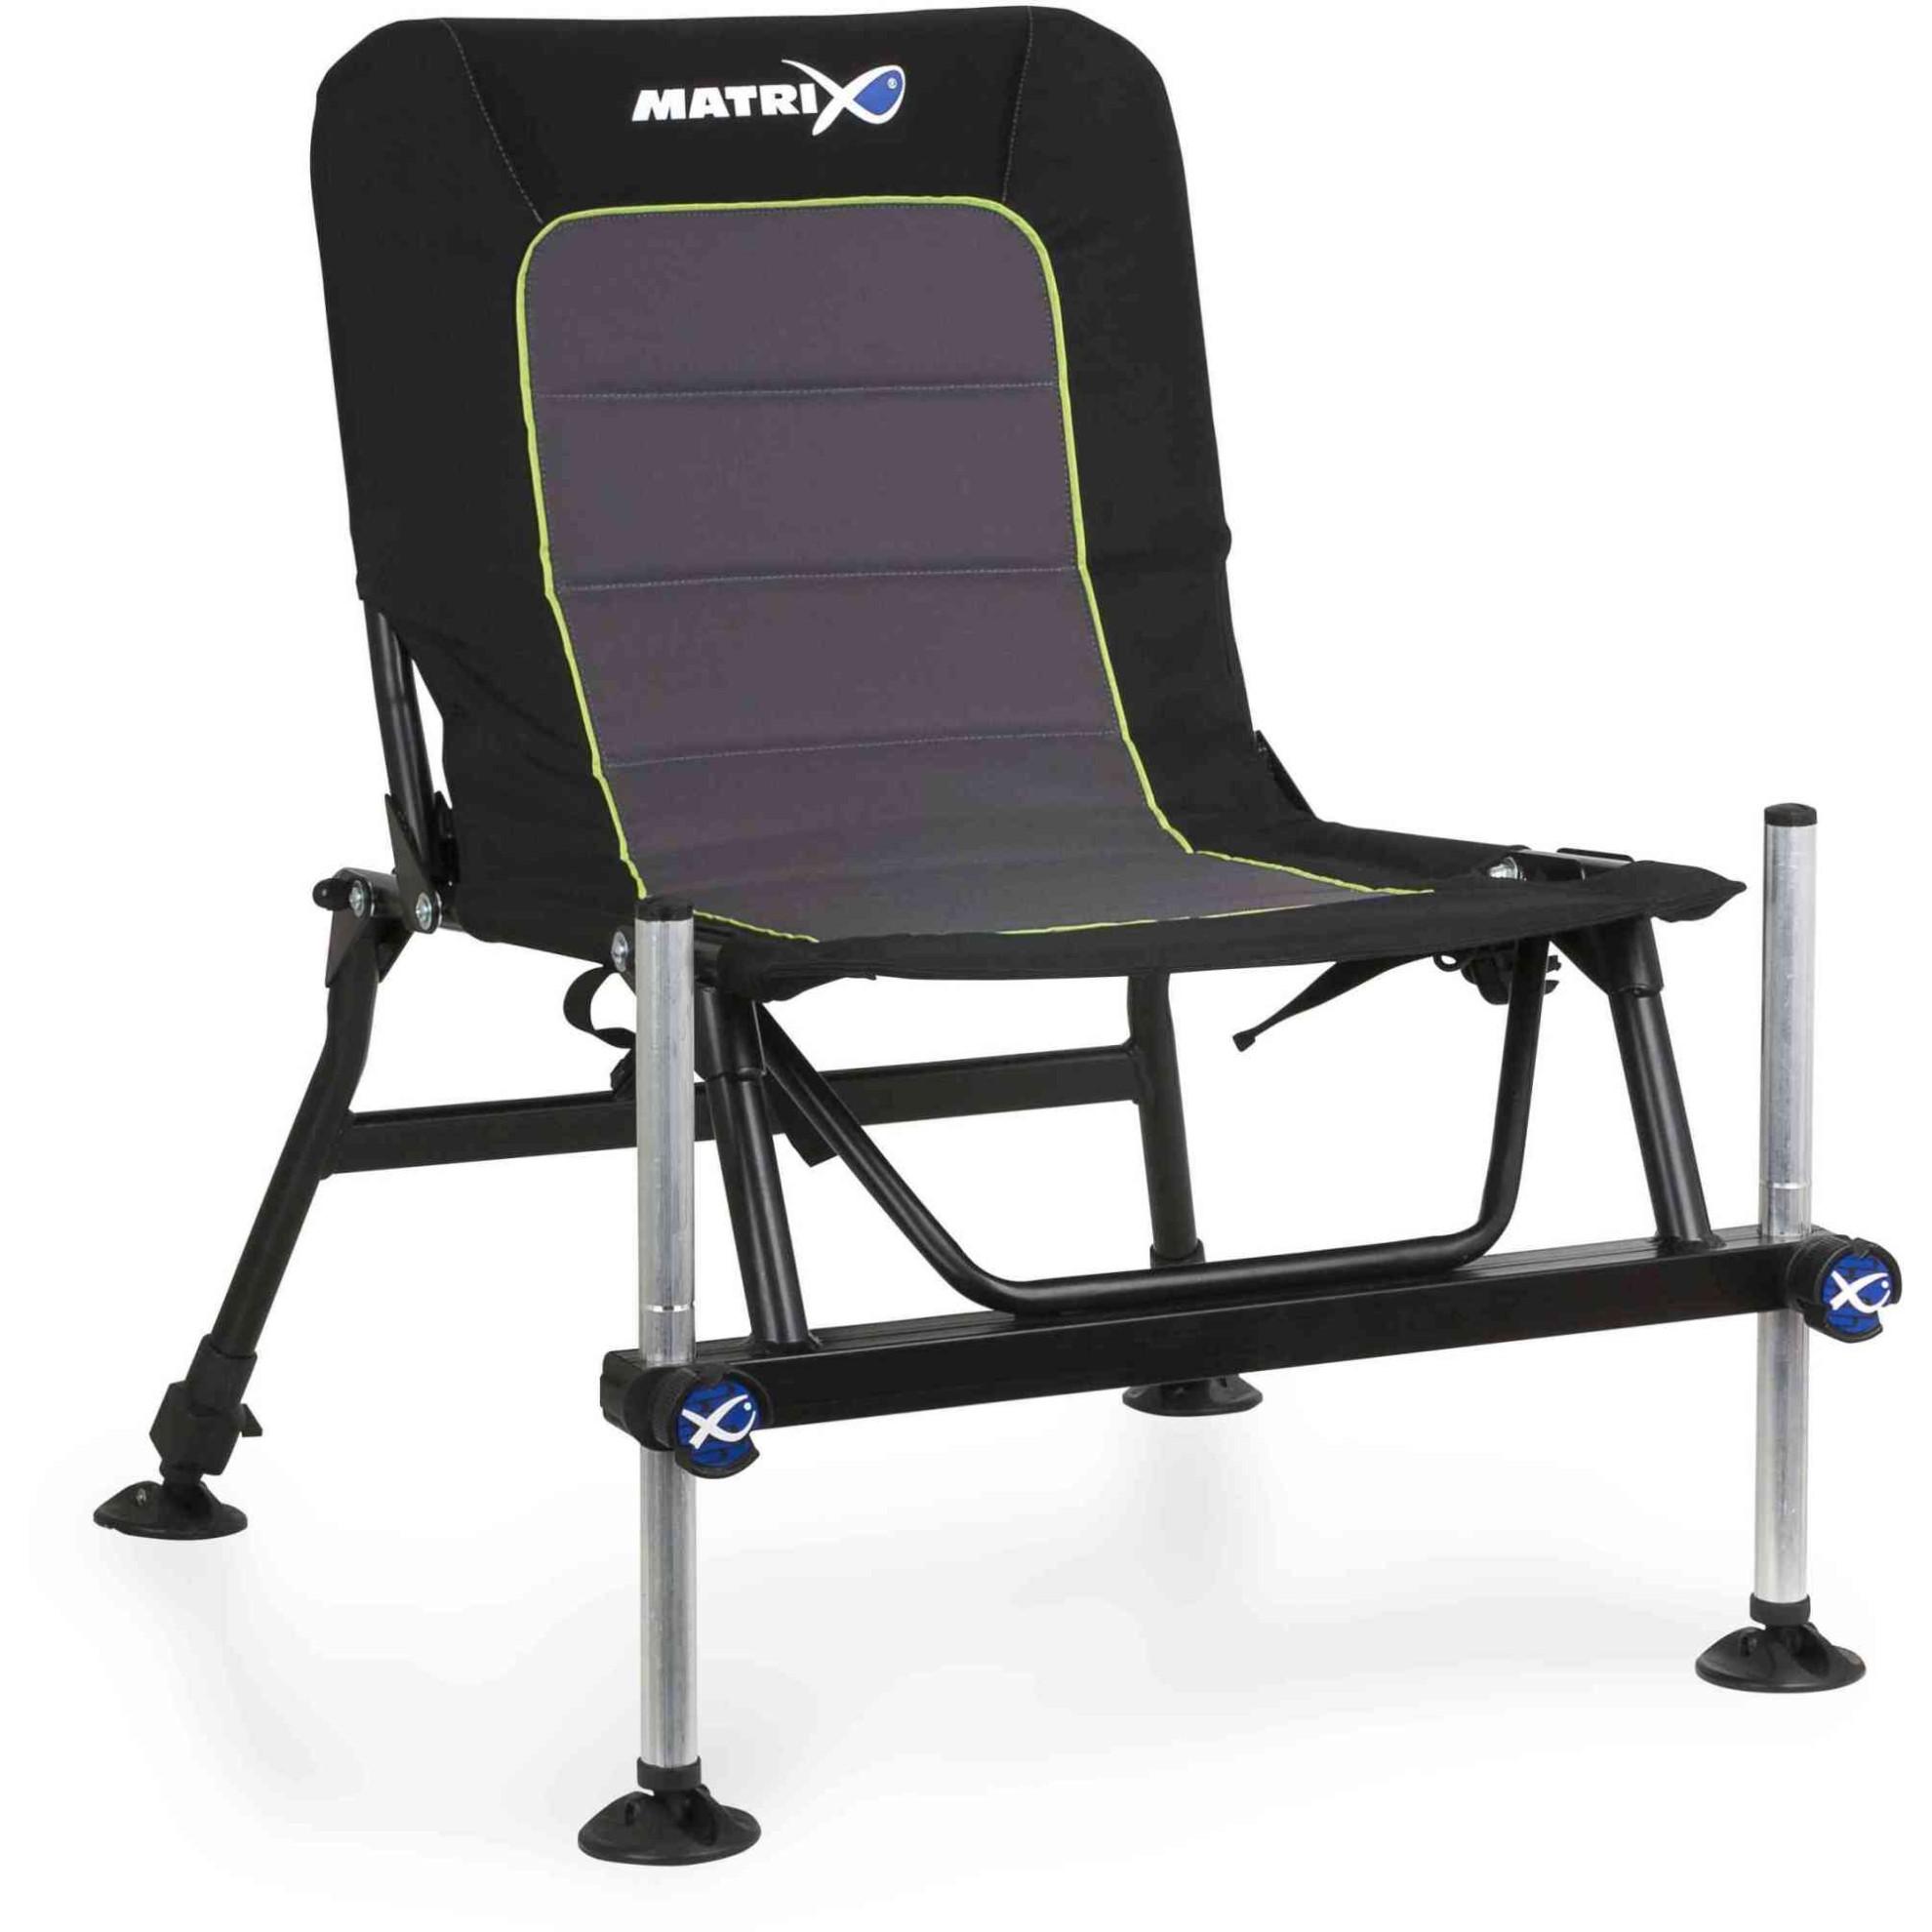 Fox Matrix Accessory Chair Fishingtackle24 Angelbedarf